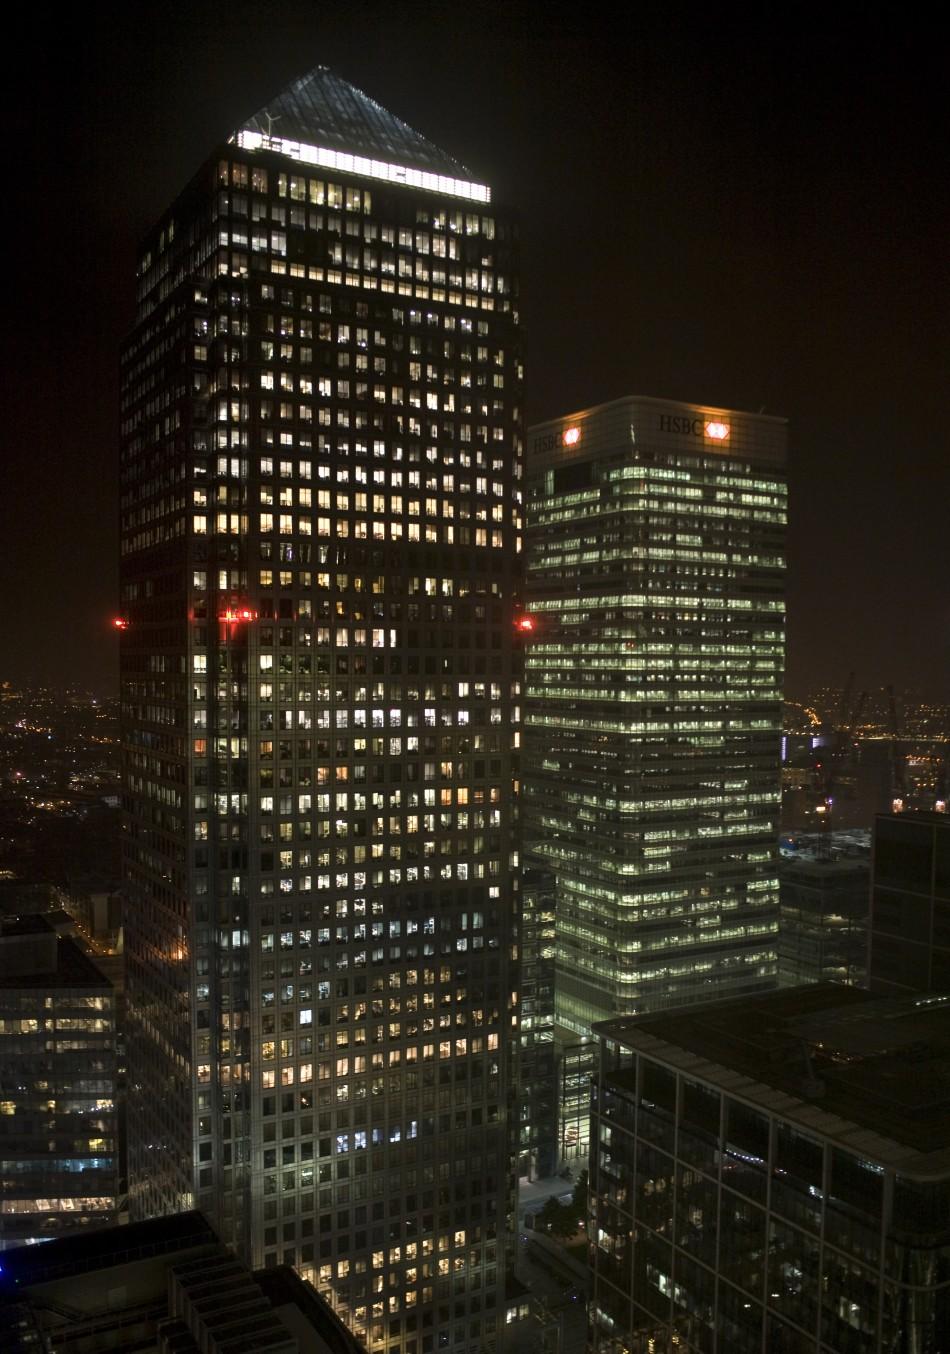 UK Companies Reports Lower Profitability